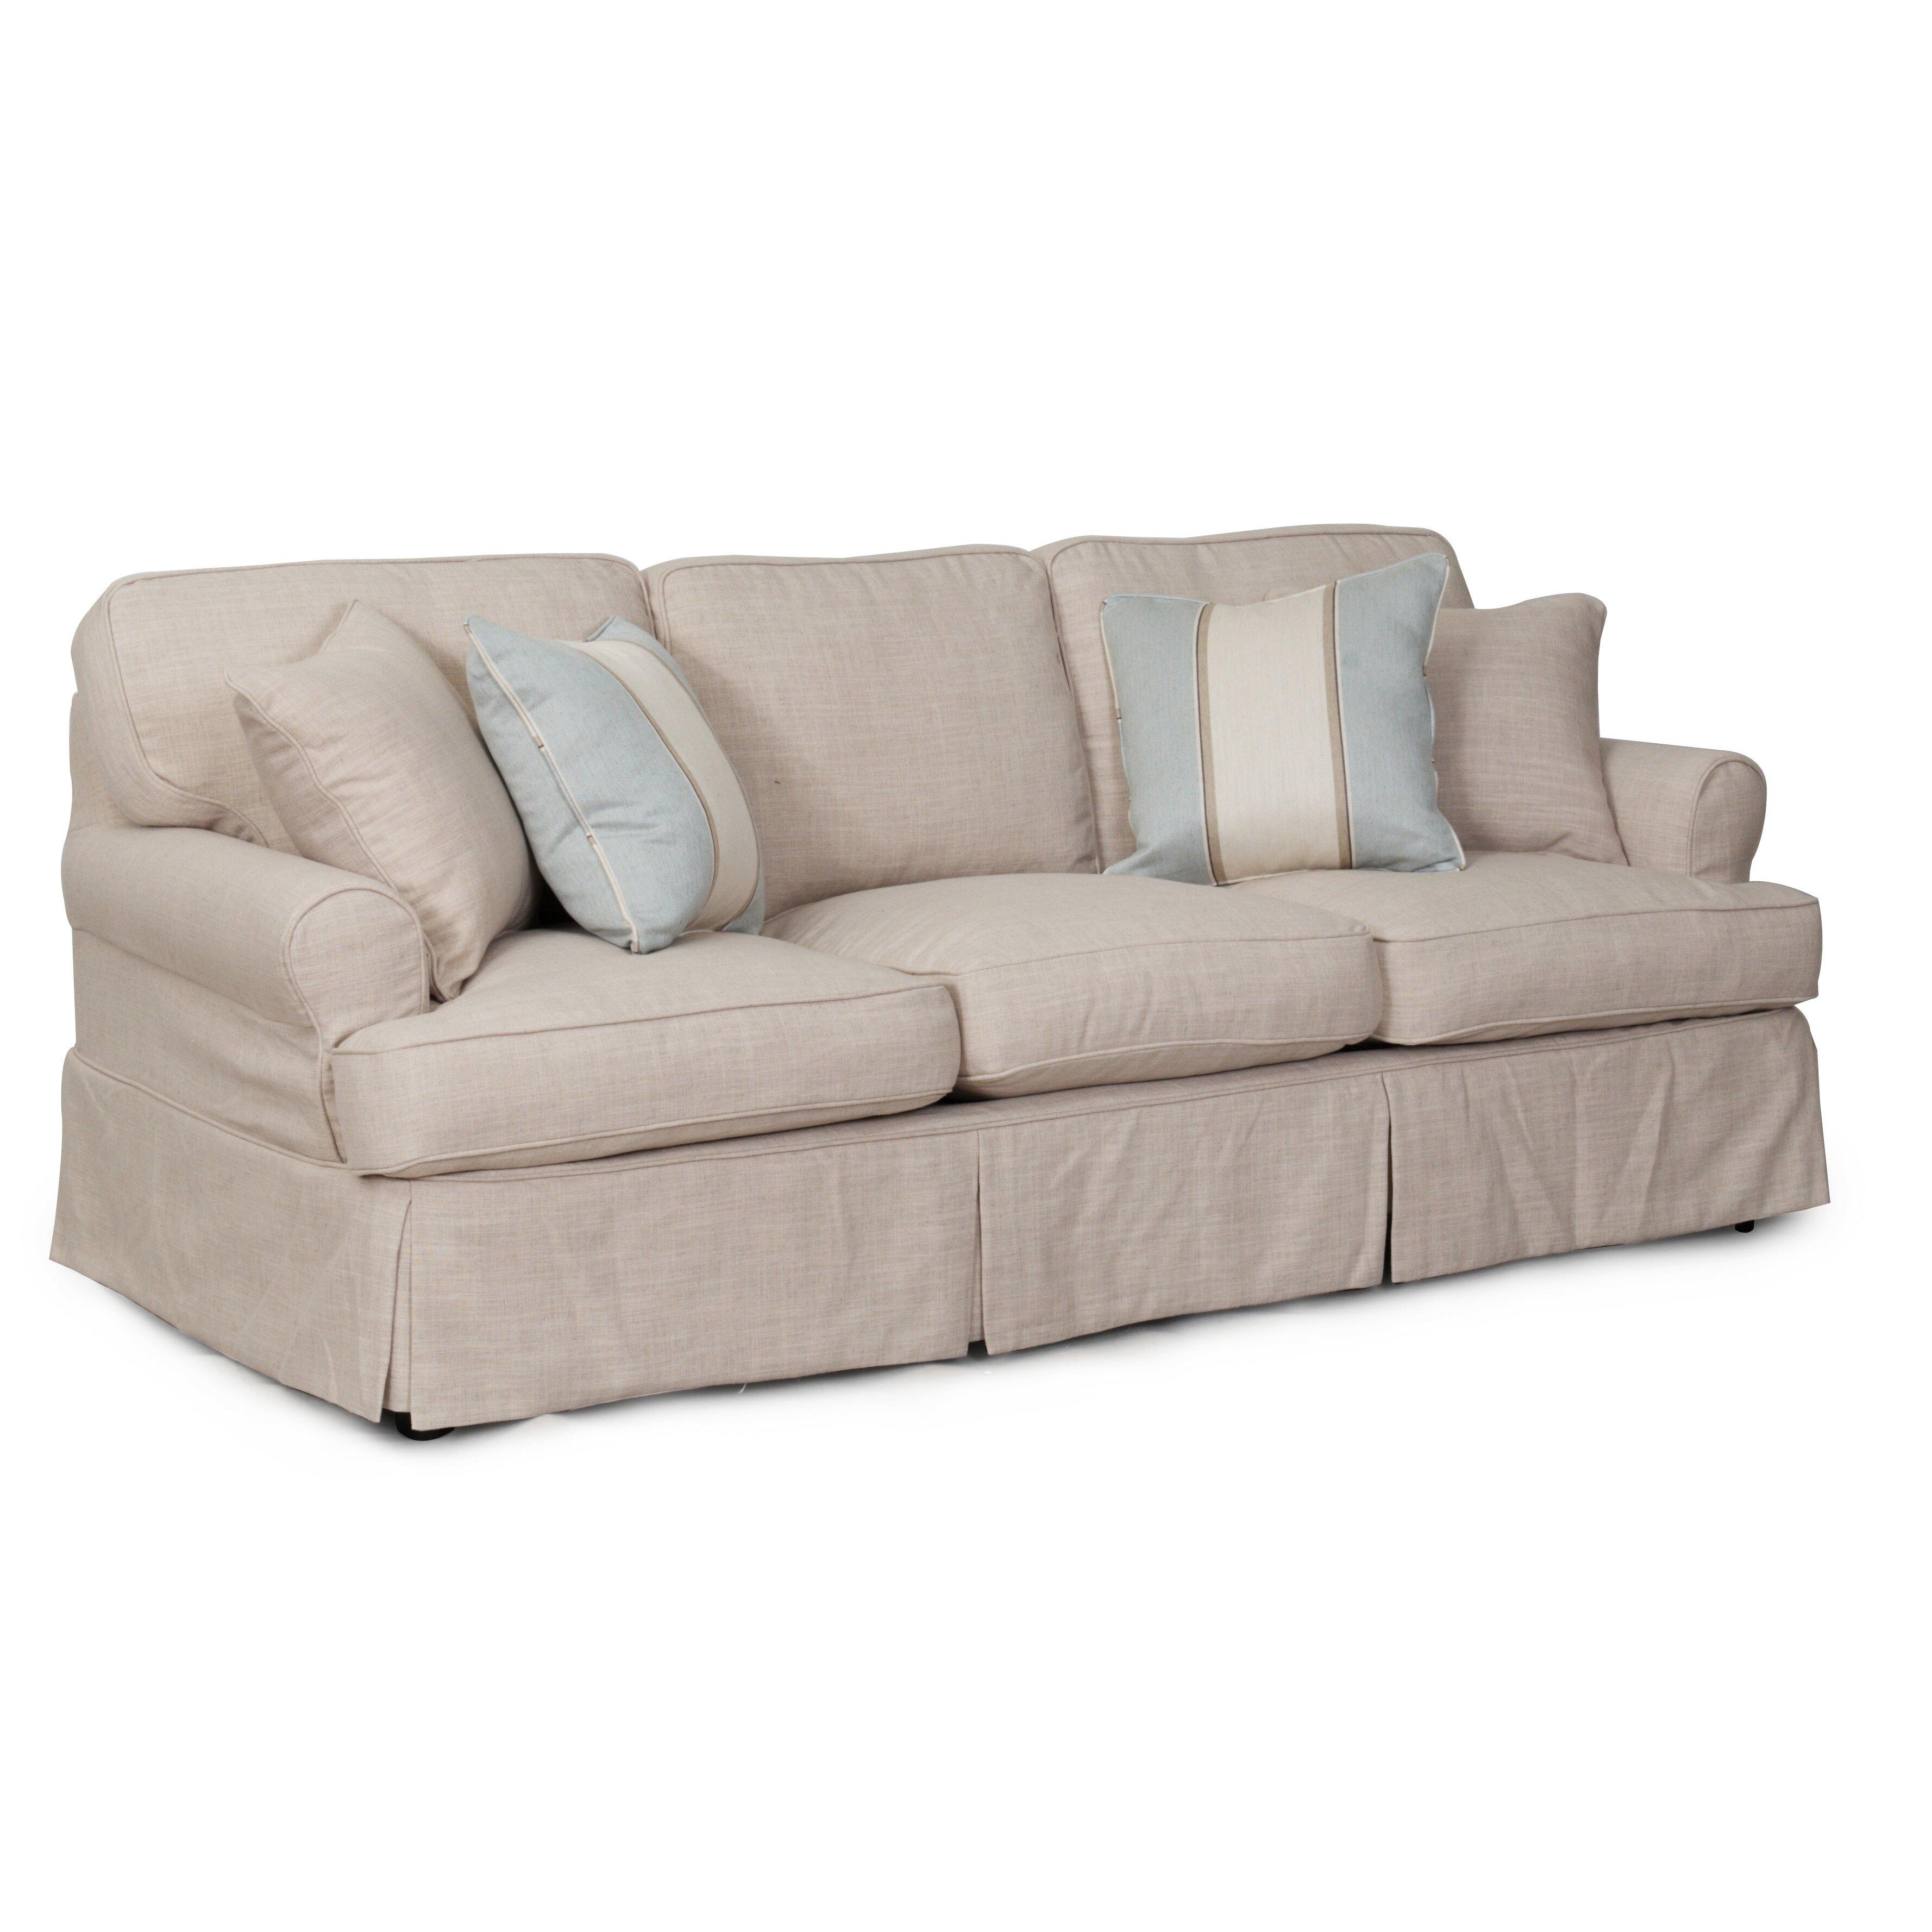 Queen Anne Camelback Sofa Slipcover Sofa